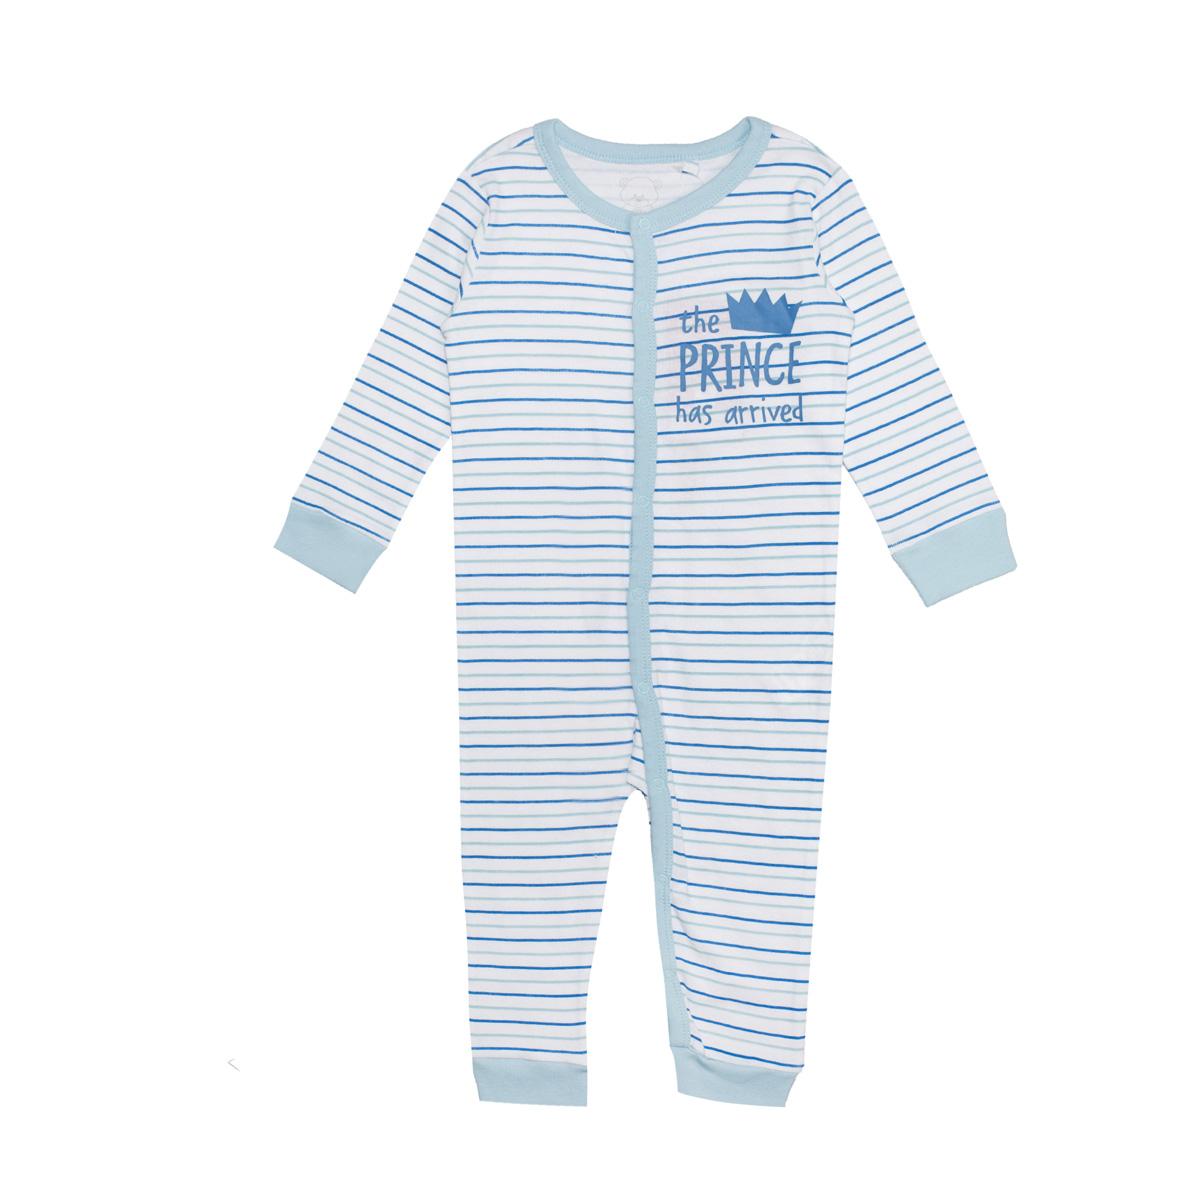 Baby kombinezon, svetlo modra